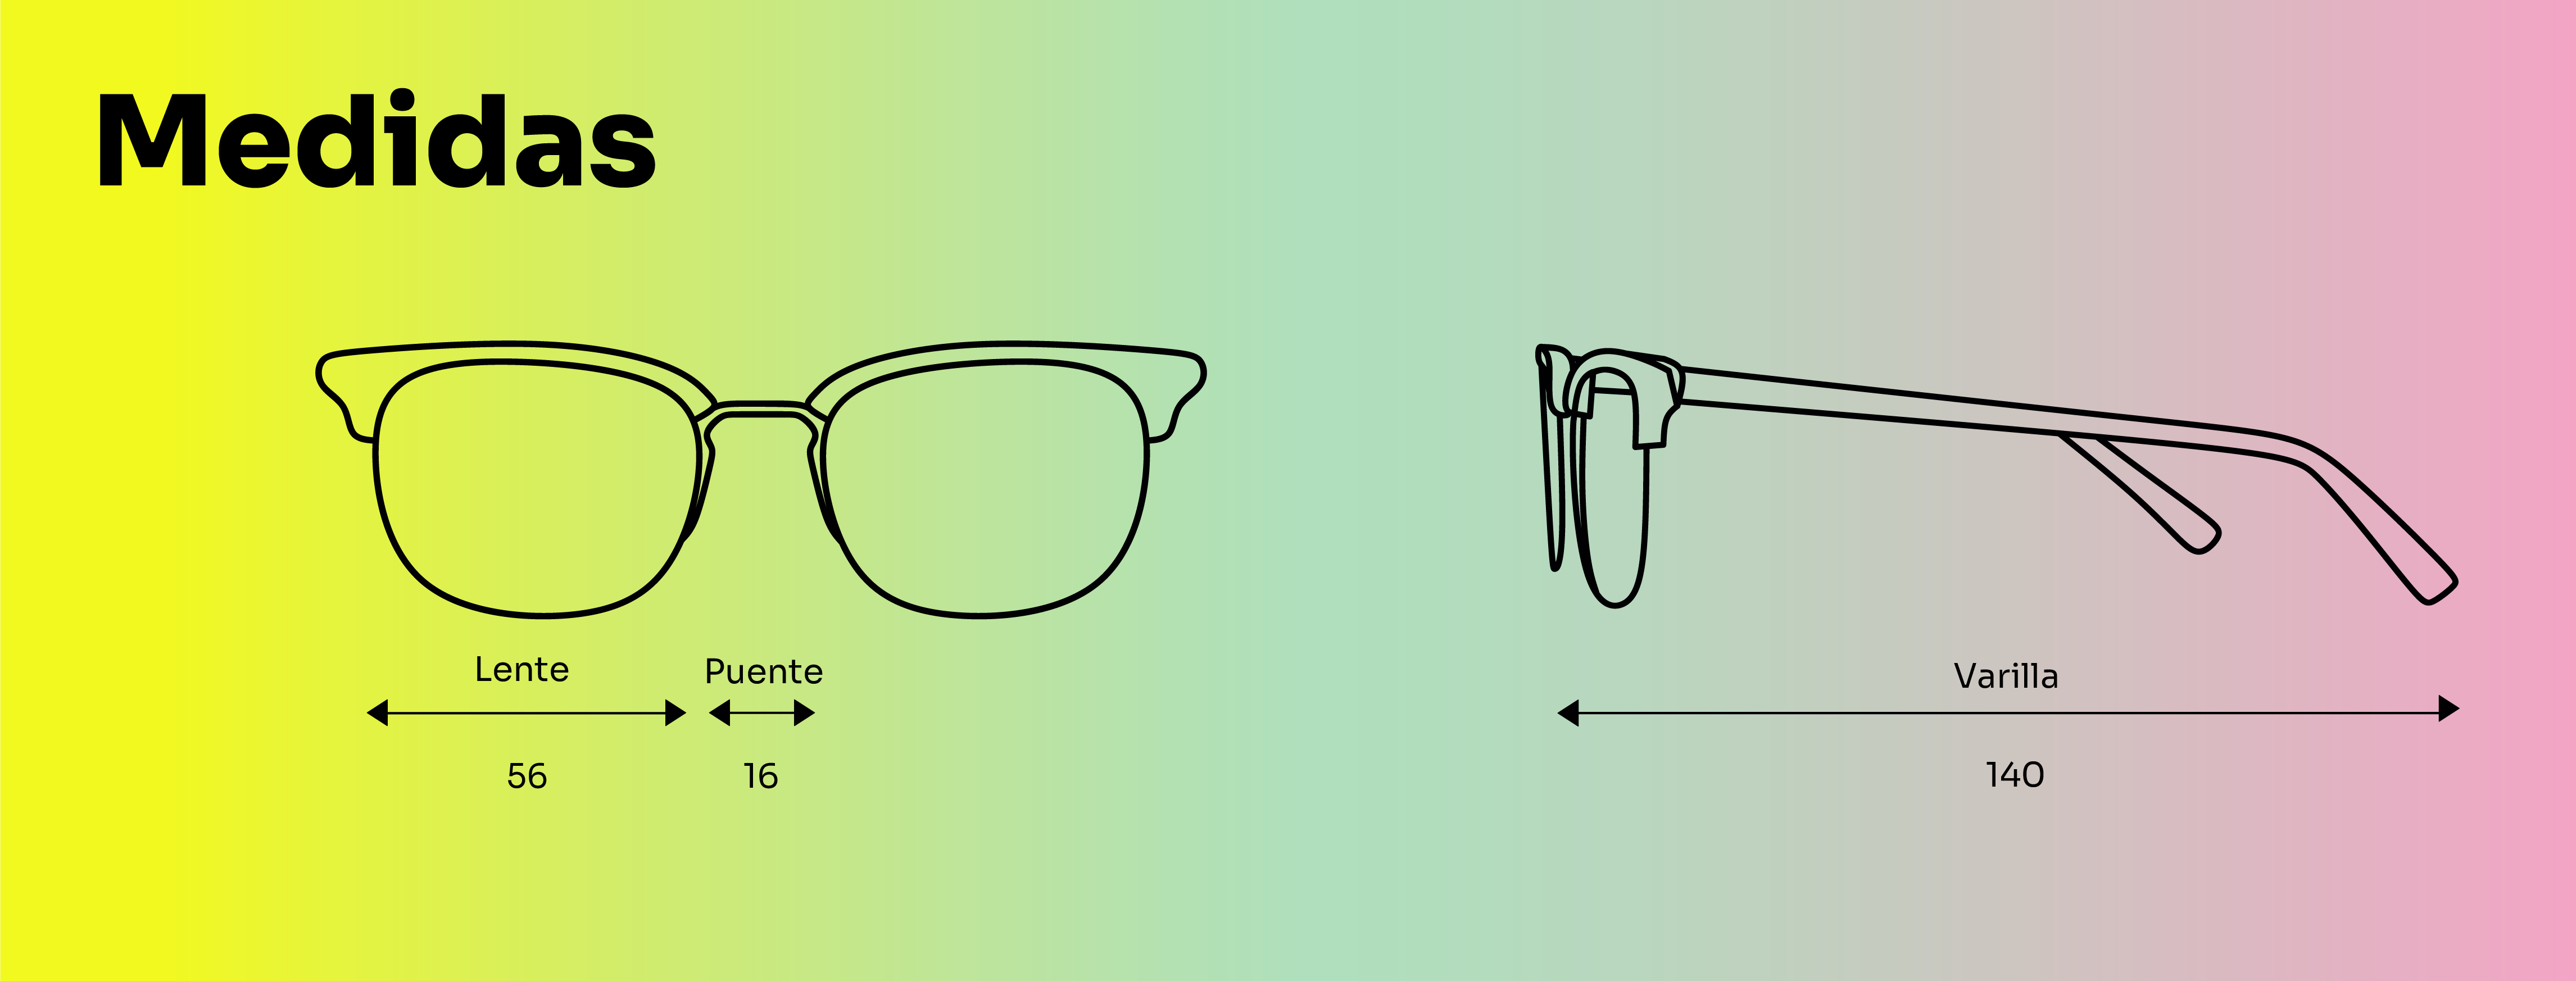 medidas-montura-de-gafas-graduadas-de-marca-Kala